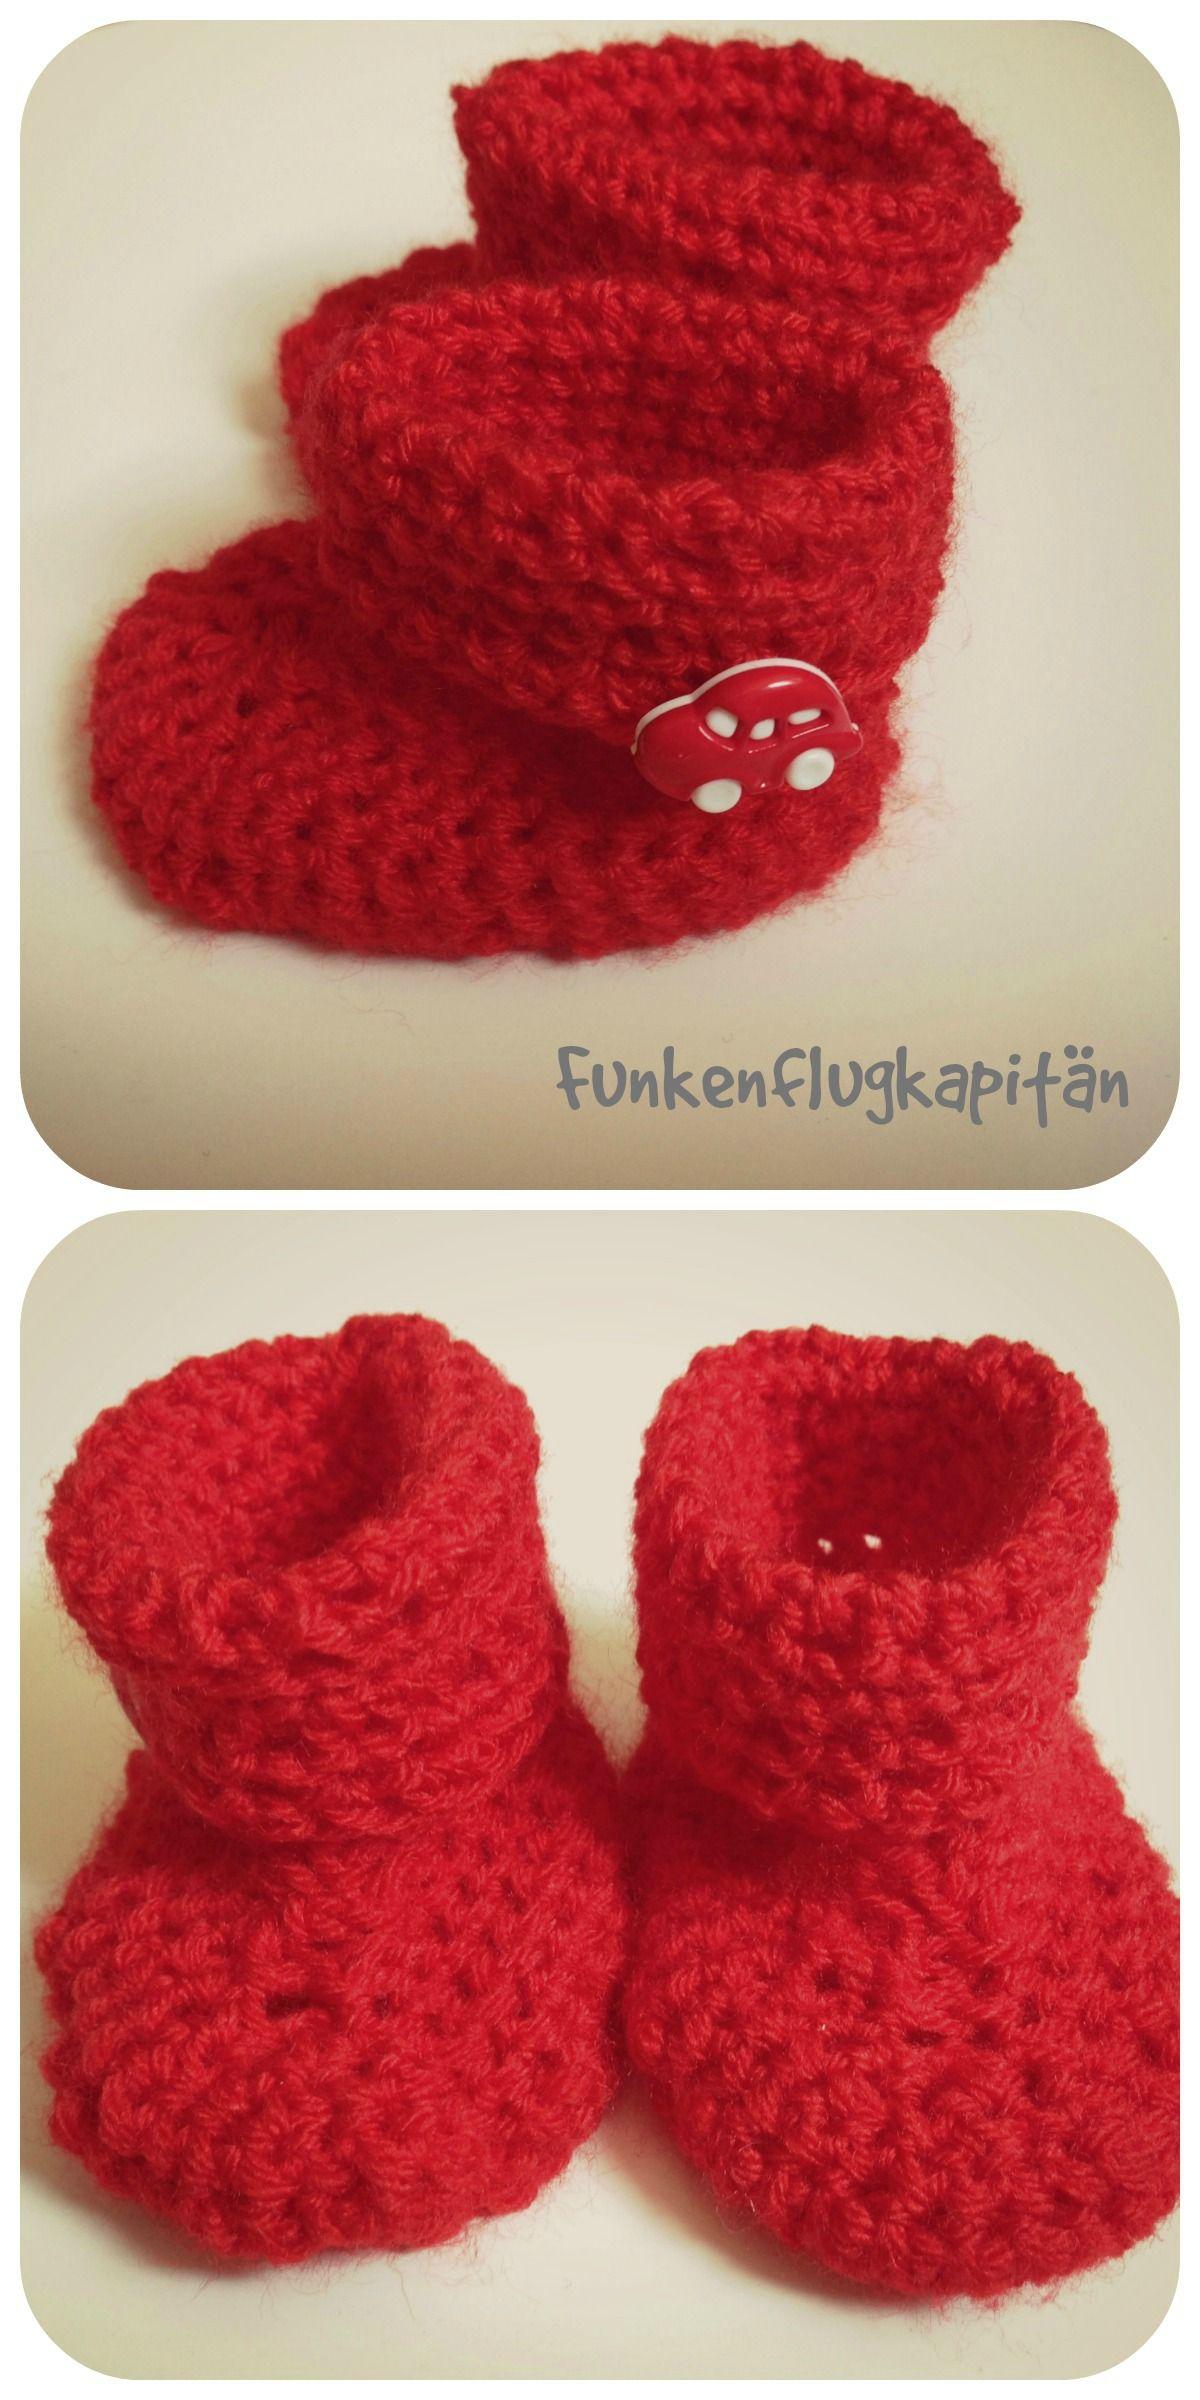 baby boots crochet, Babyschuhe häkeln | Wollsachen | Pinterest ...